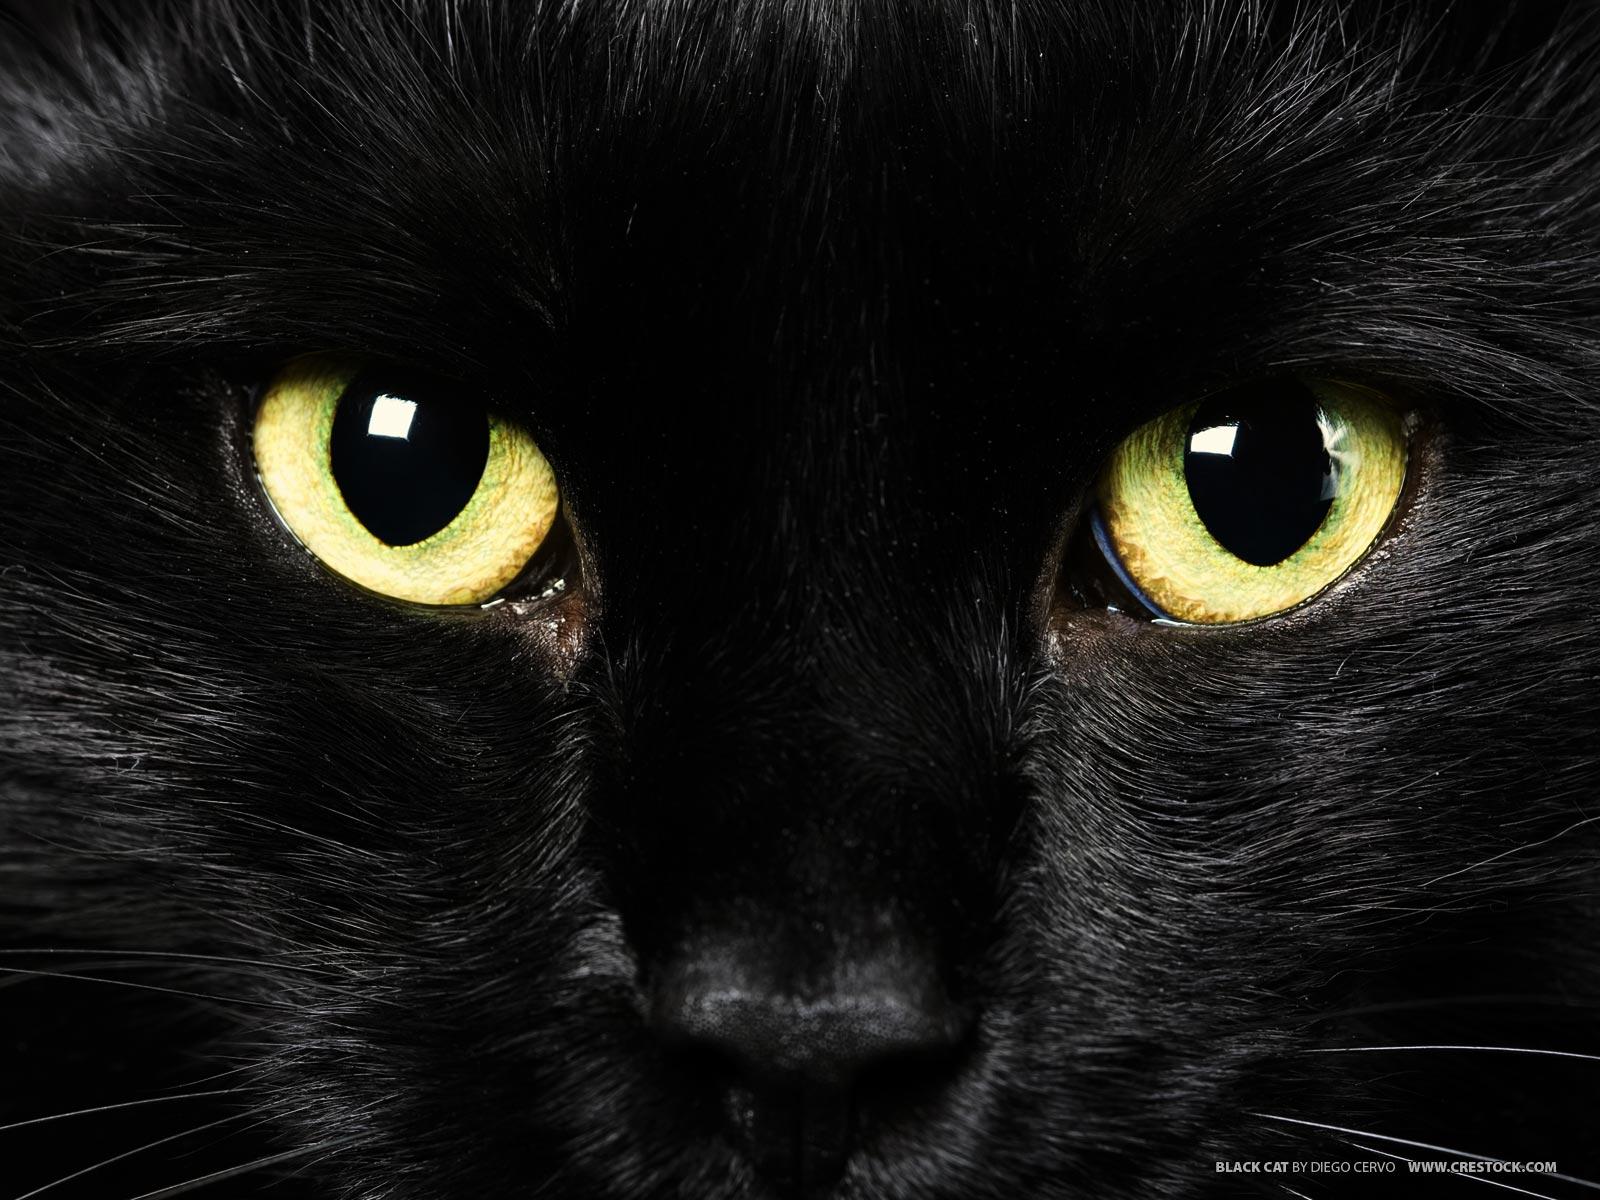 Black Cat Background Tumblr Black Cat Tumblr Wallp...